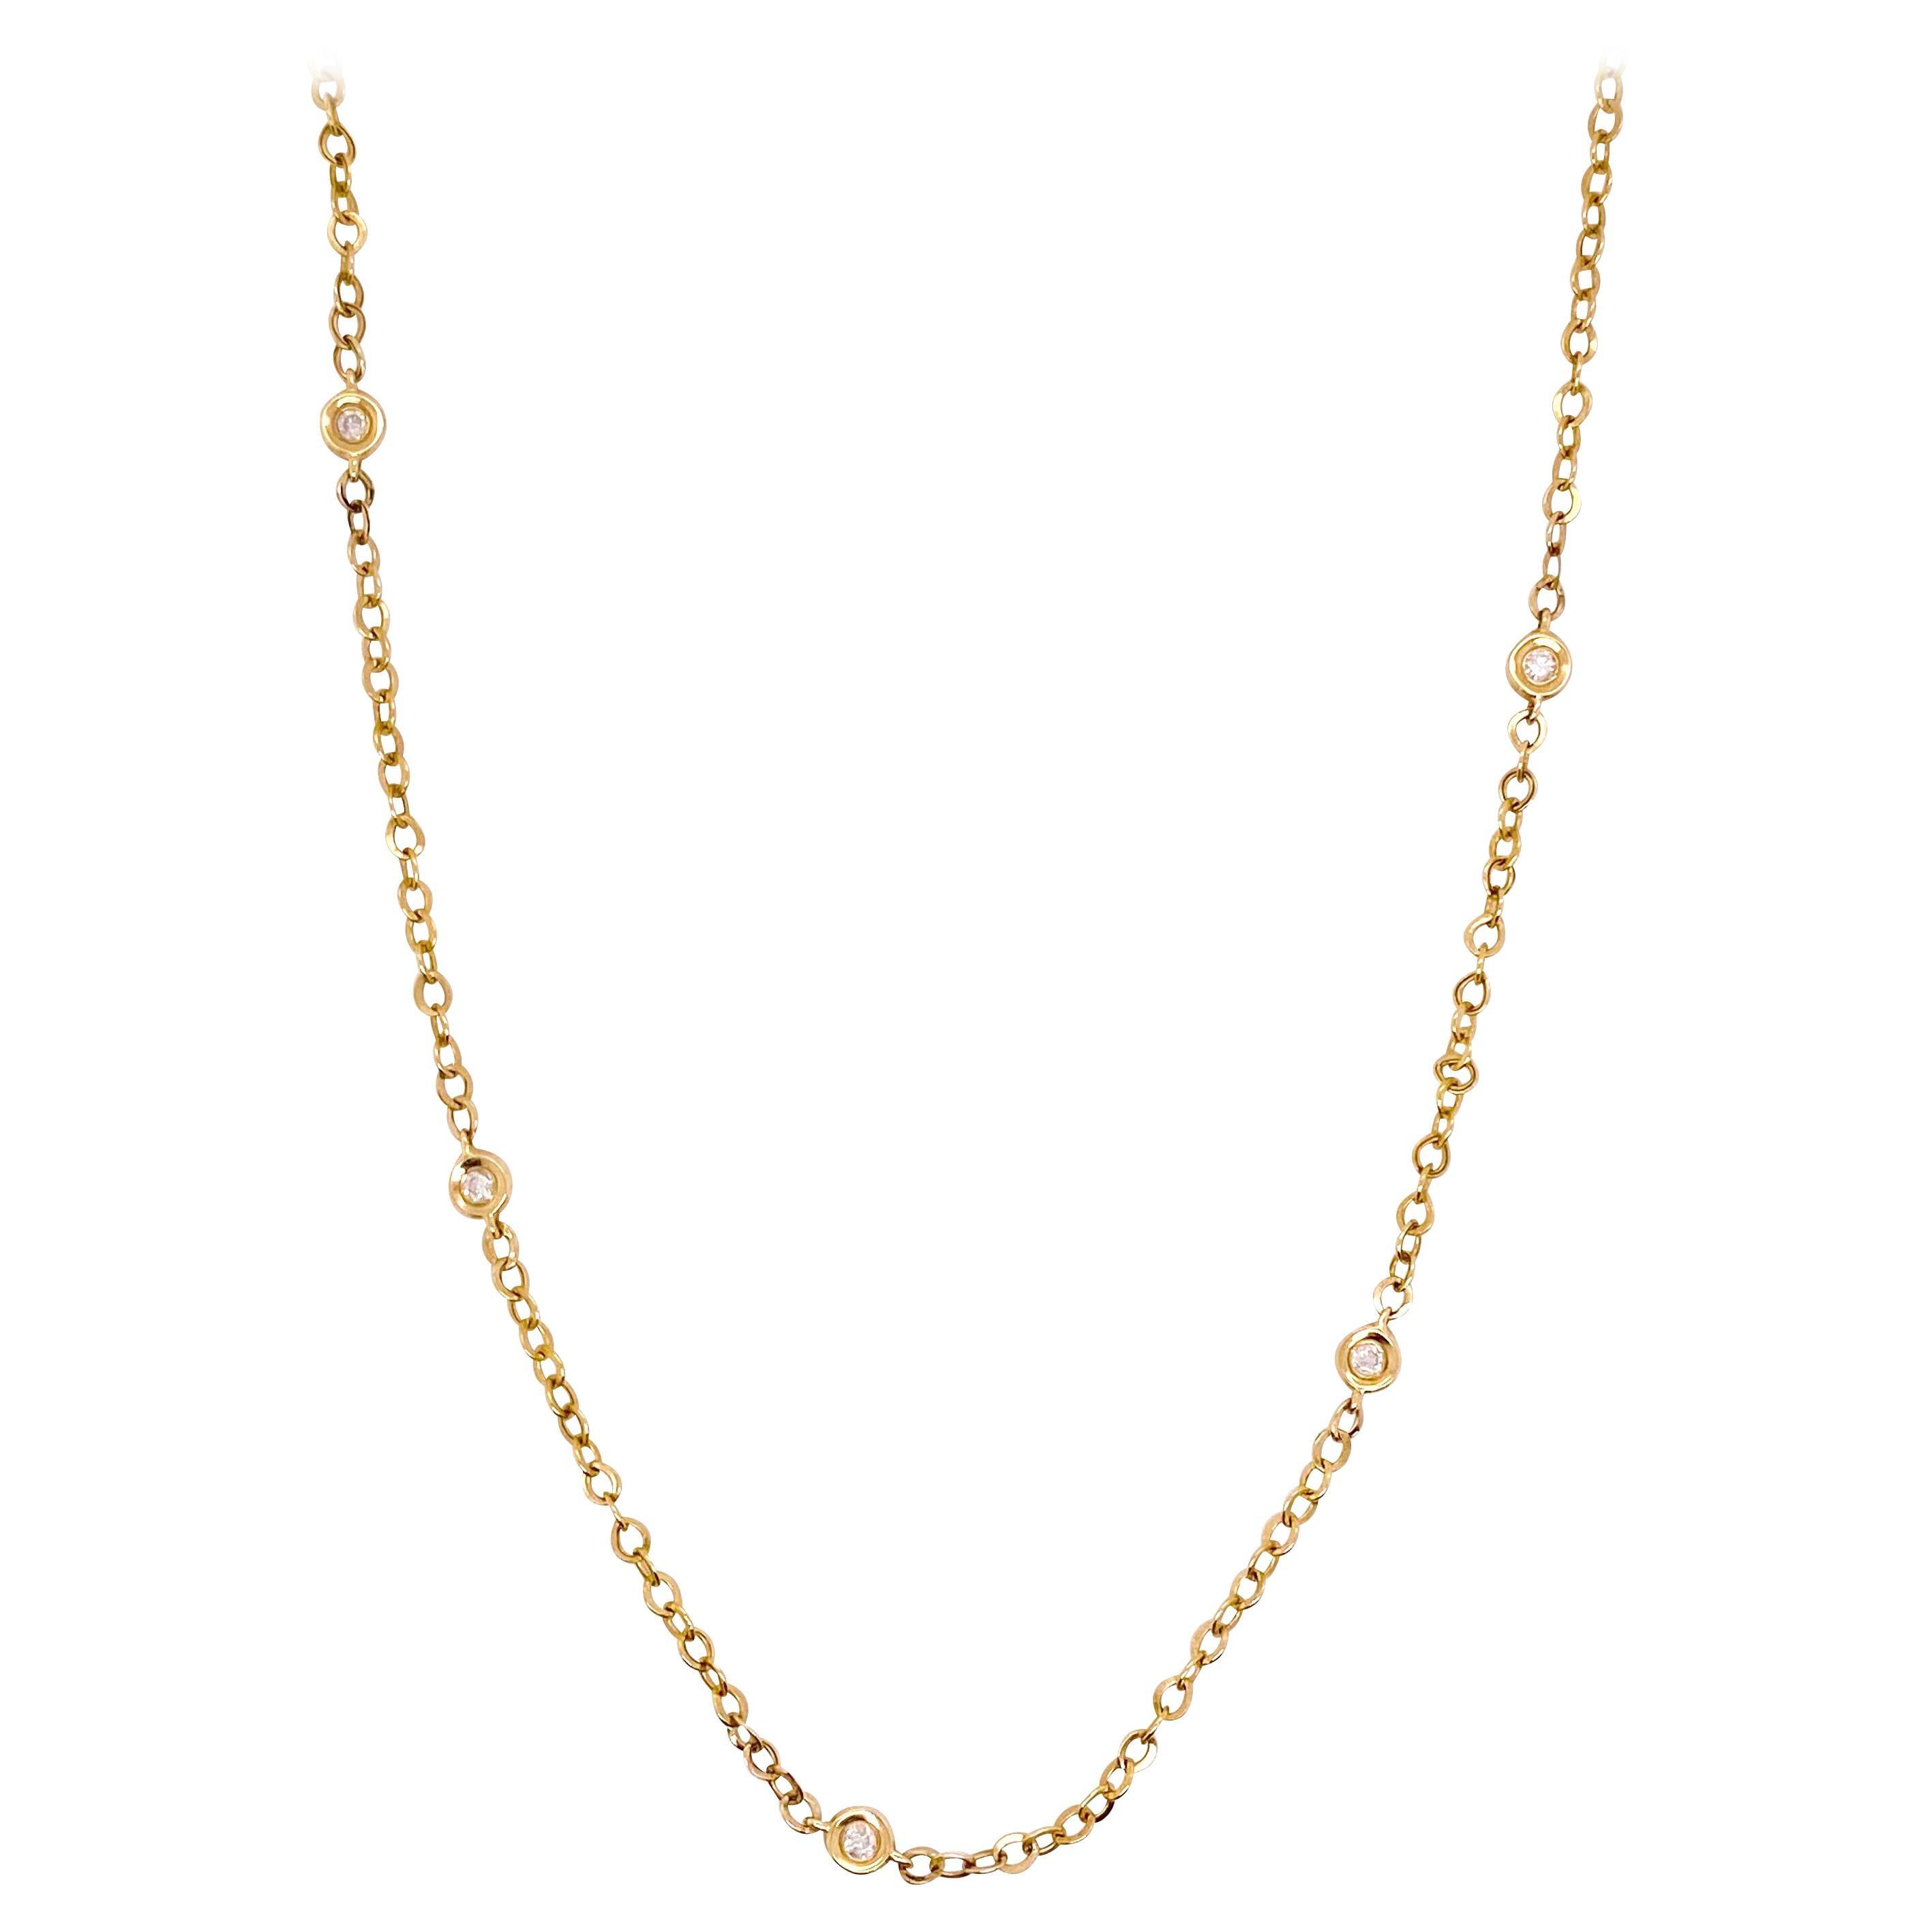 Diamond by Yard, Necklace, 7 Bezel Diamonds in Yellow Gold Diamonds by the Inch